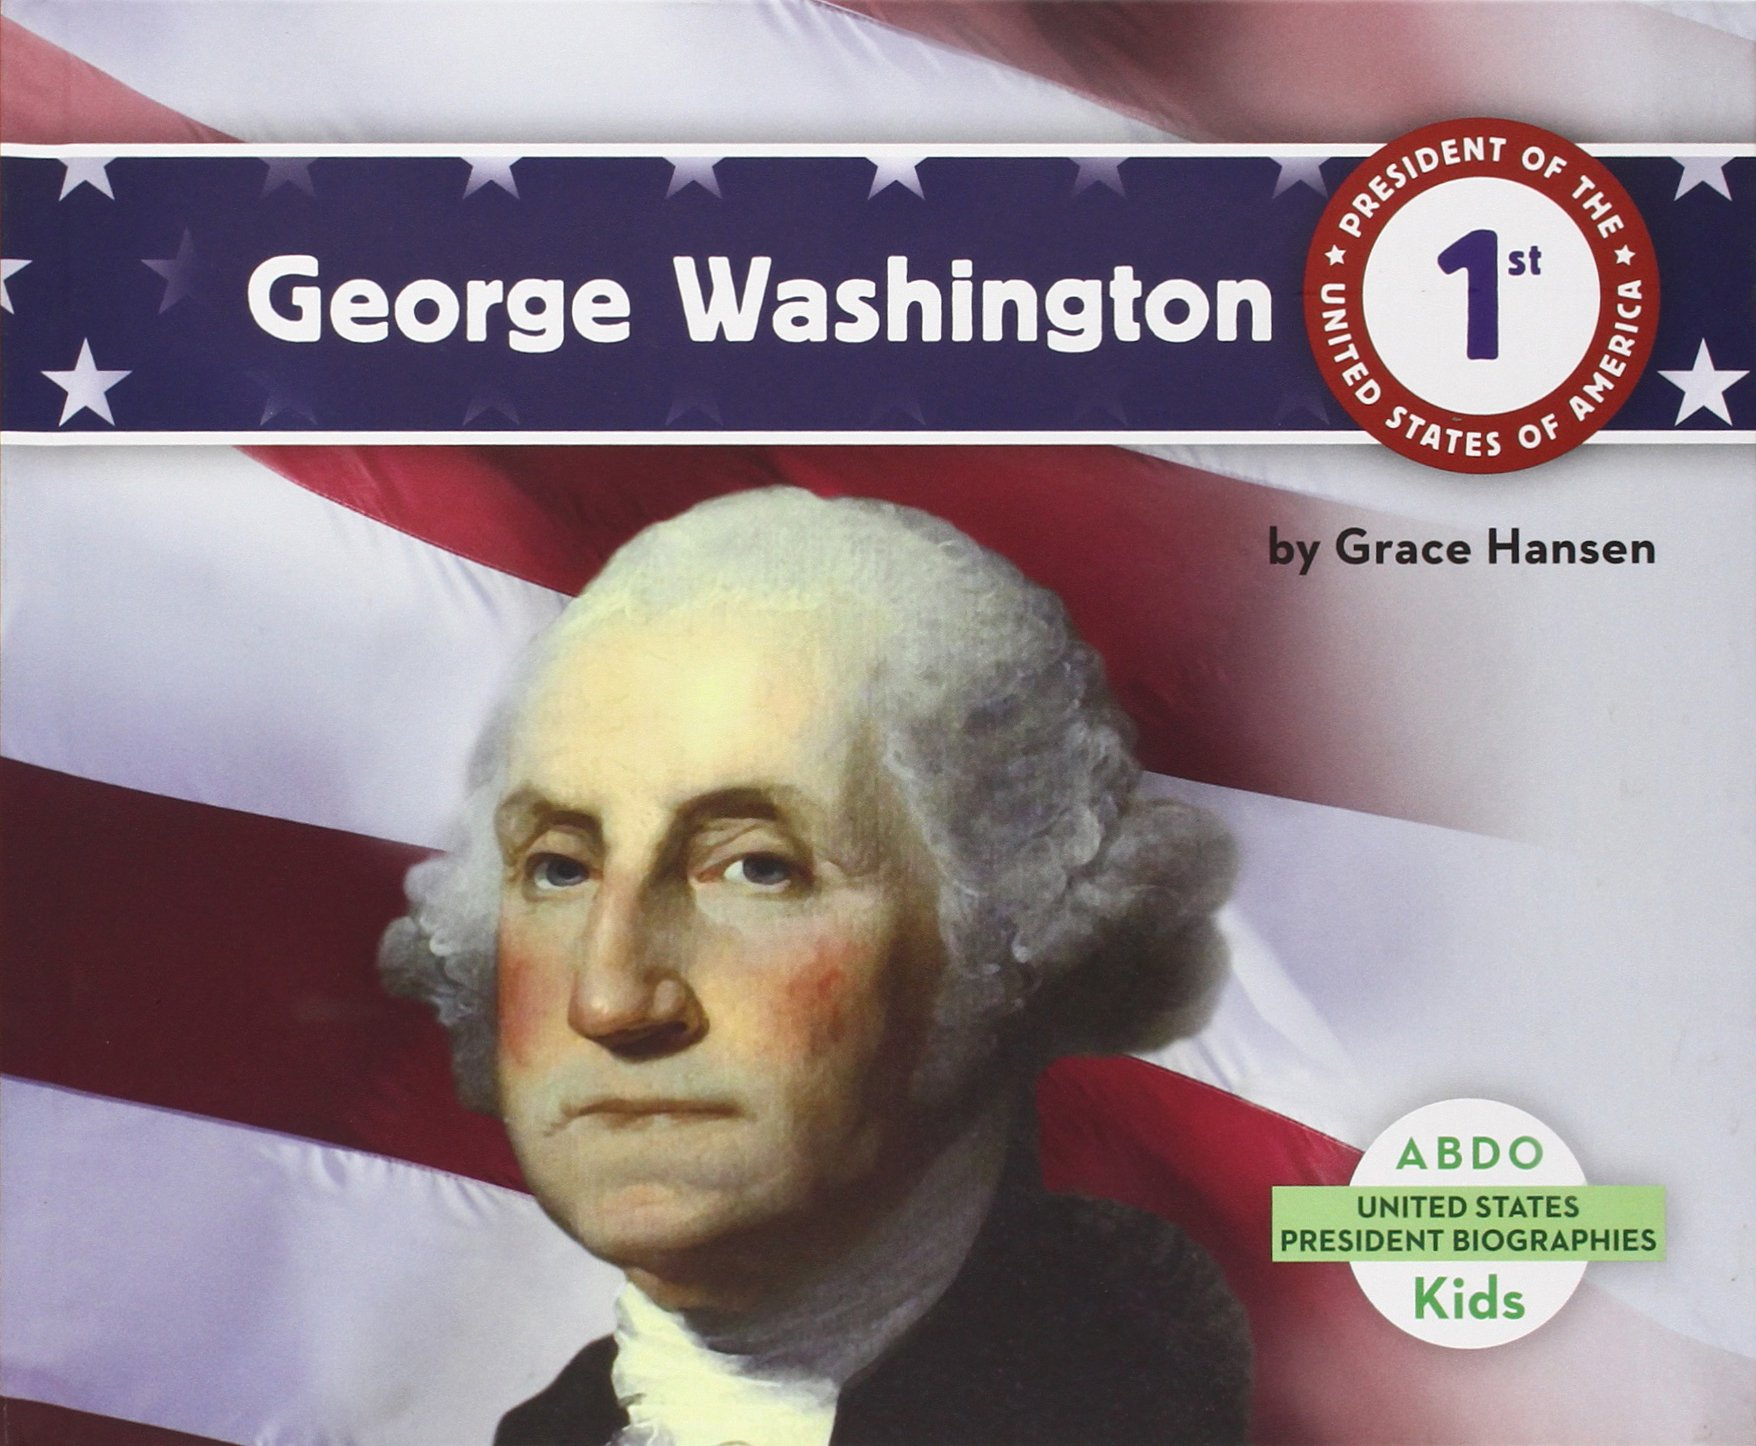 George Washington (United States President Biographies)